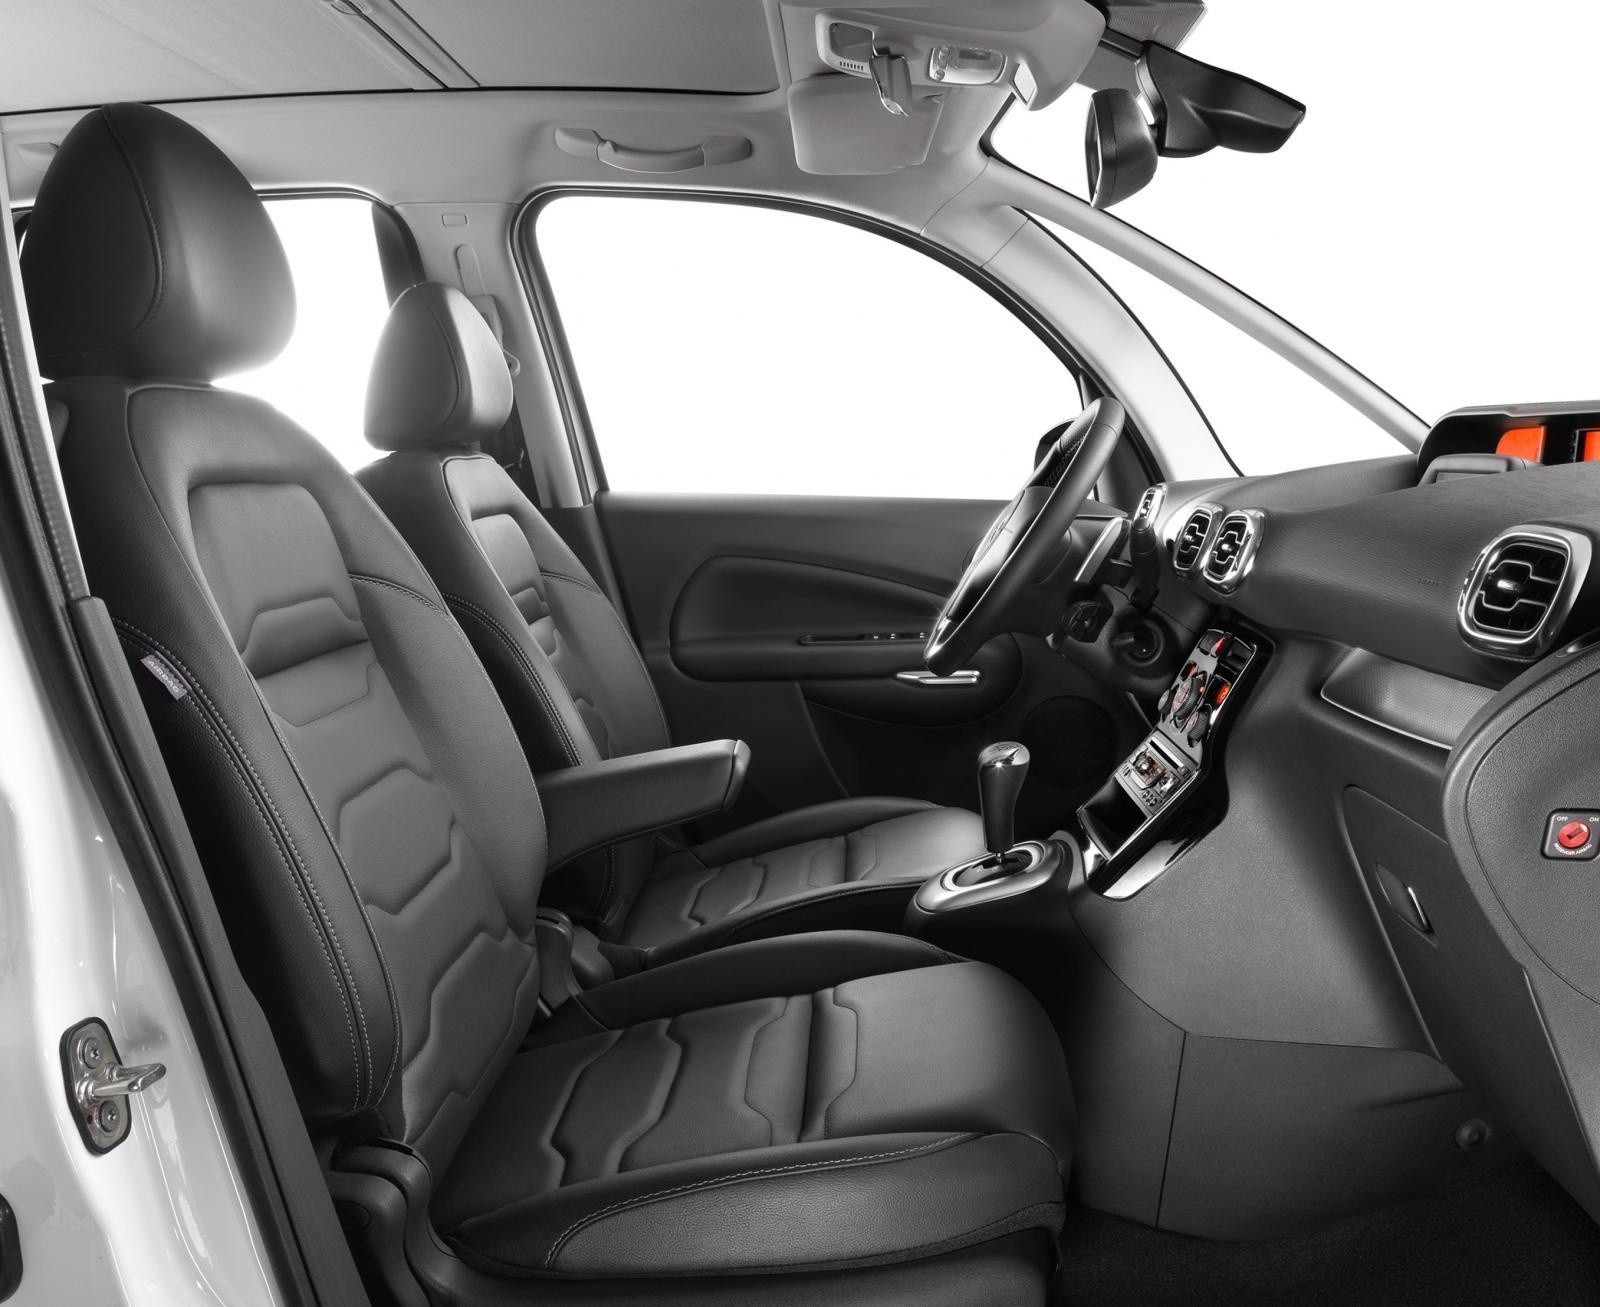 citroen c3 picasso gets updated for 2013 autoevolution. Black Bedroom Furniture Sets. Home Design Ideas